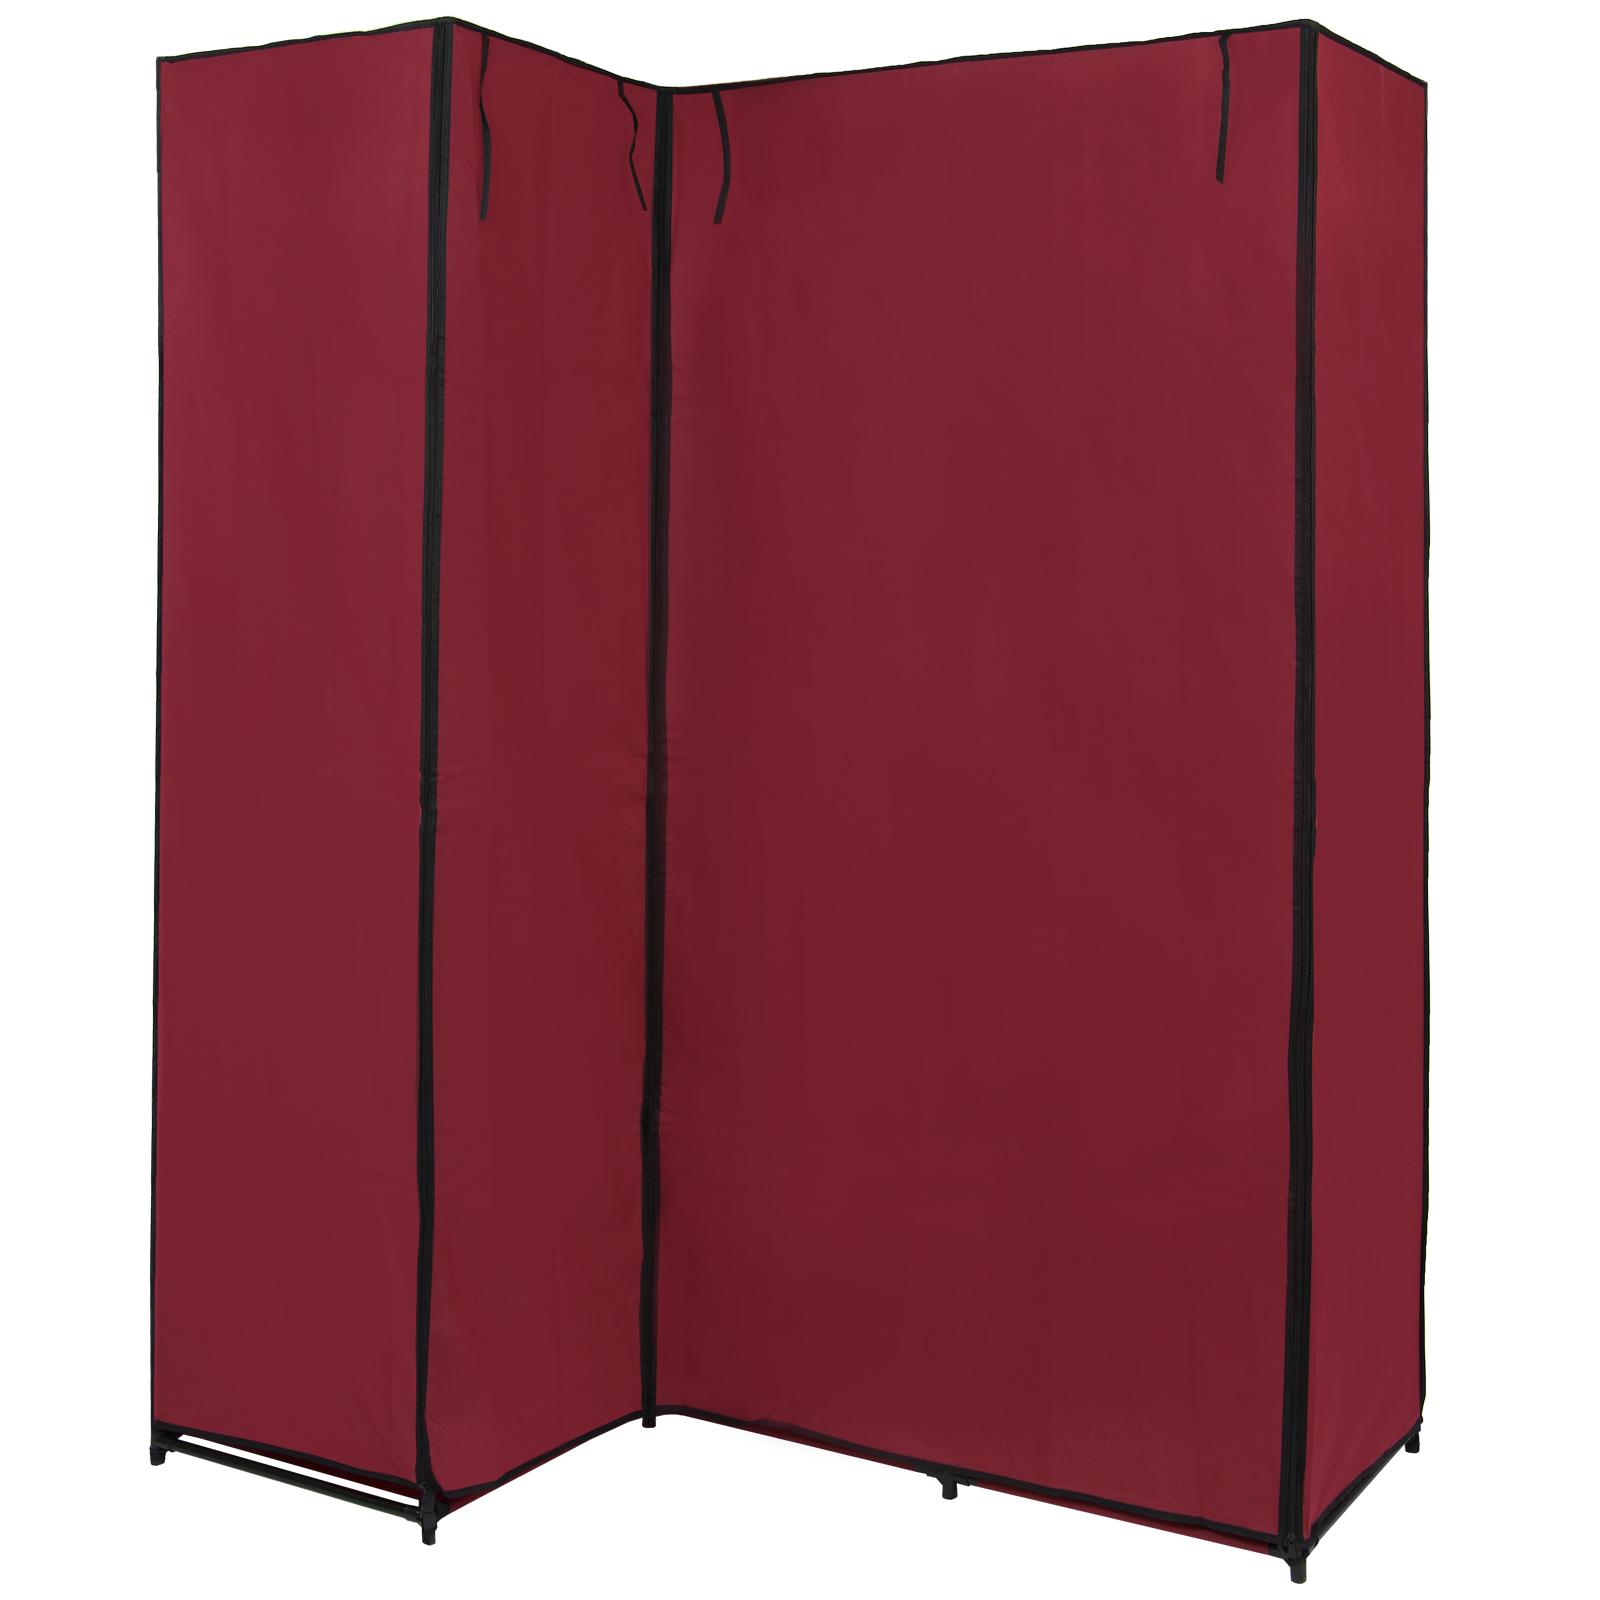 eck kleiderschrank stoffschrank faltschrank koana 169 x 130 x 45 cm steckregal ebay. Black Bedroom Furniture Sets. Home Design Ideas